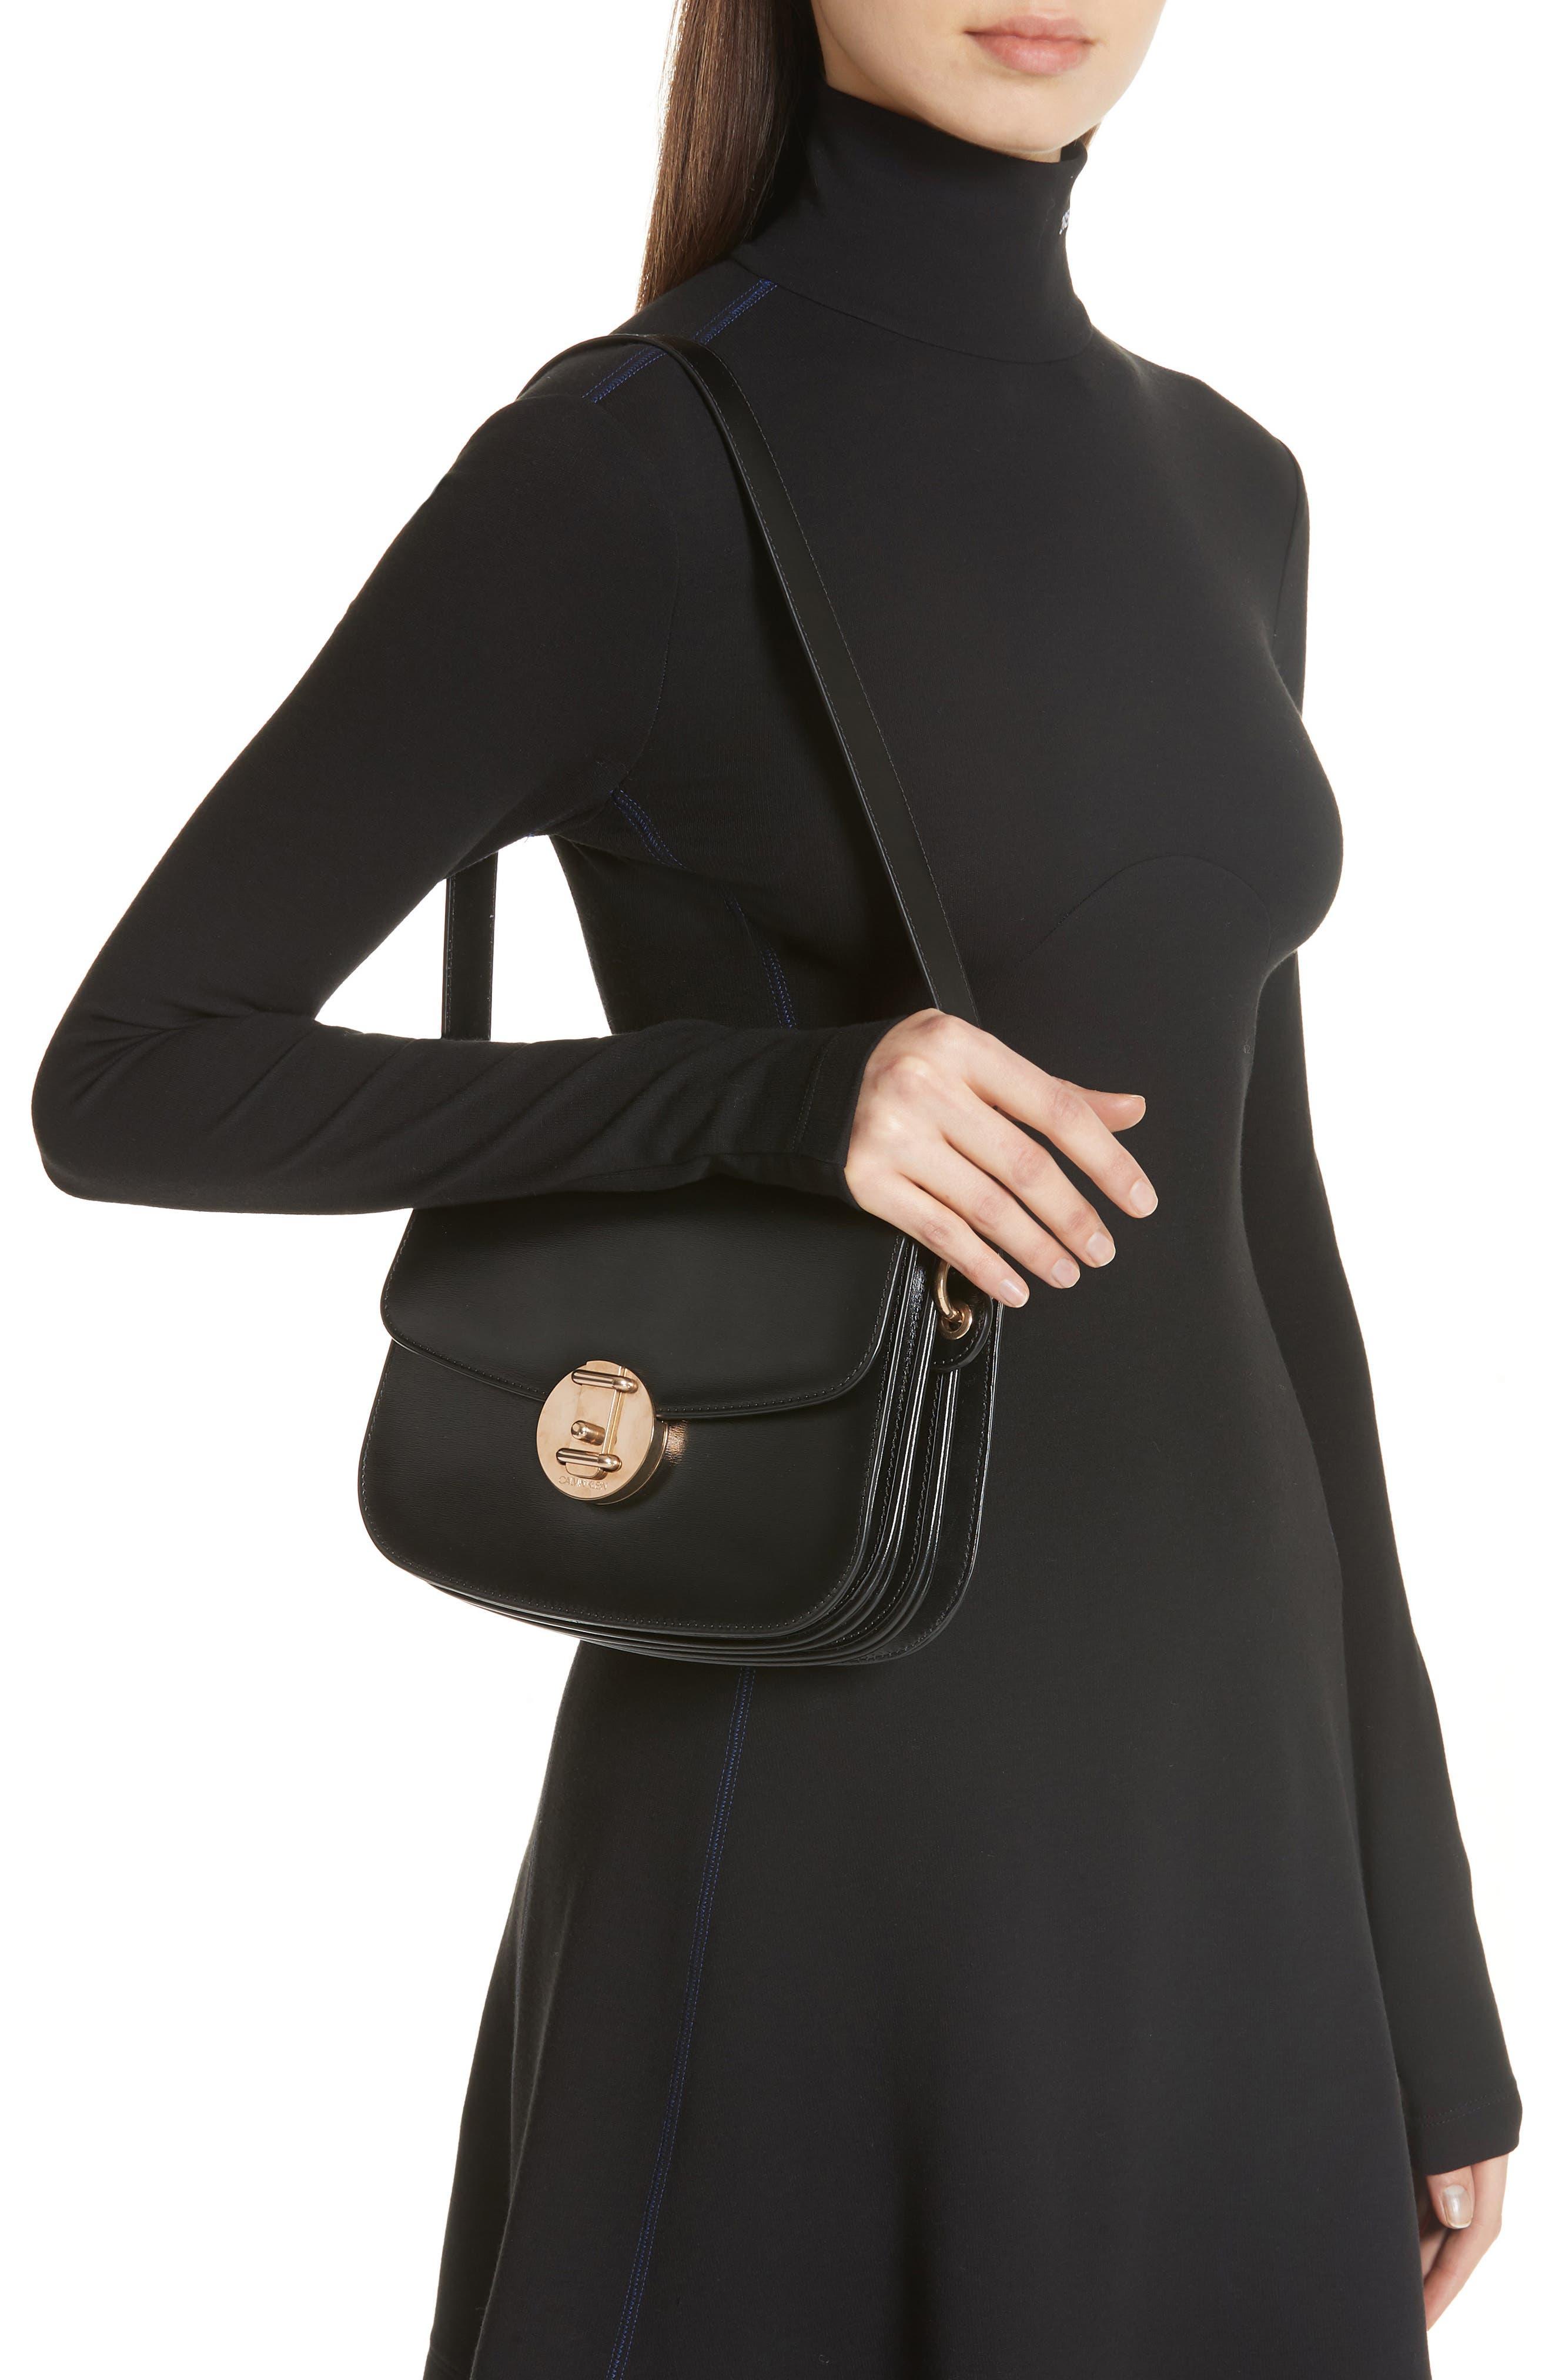 CALVIN KLEIN 209W39NYC Small Round Lock Shoulder Bag,                             Alternate thumbnail 2, color,                             BLACK